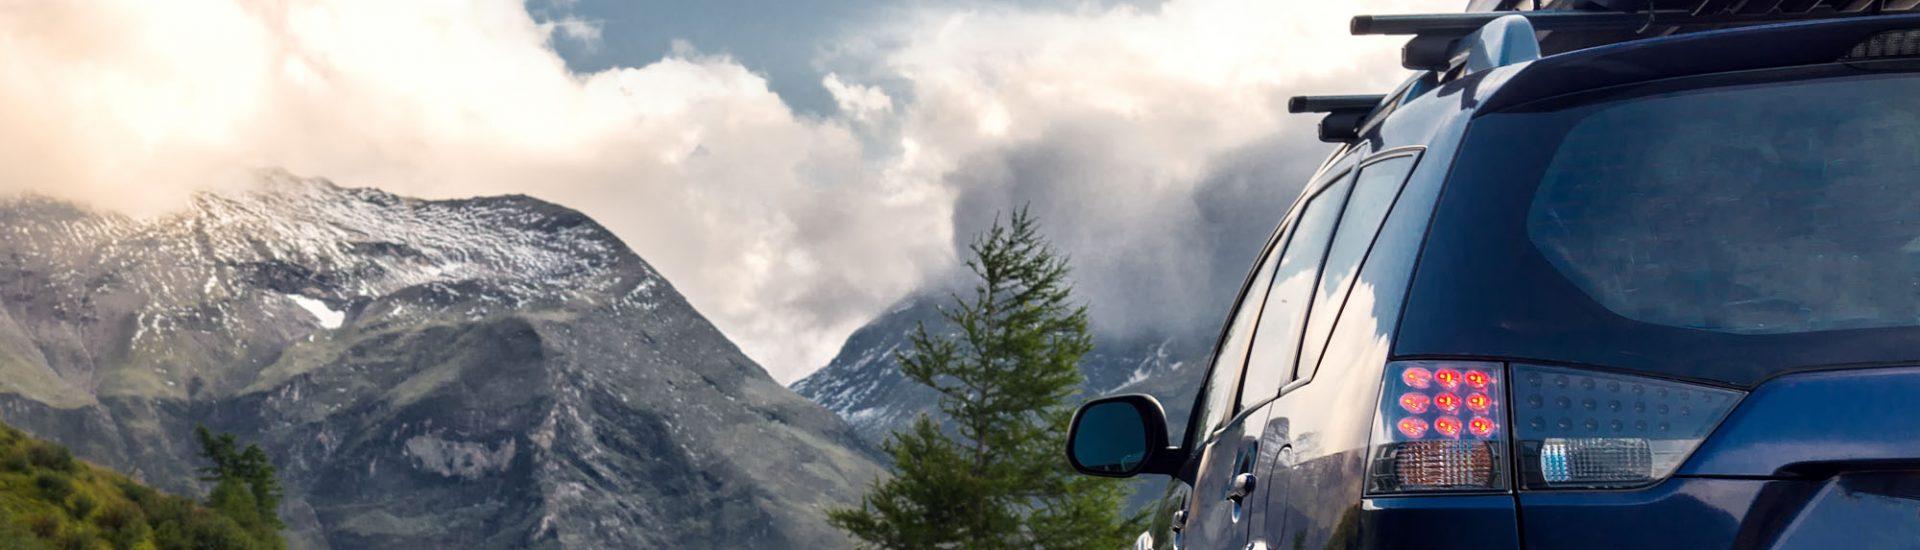 Atera Dachboxen: Top 3 Modelle im Vergleich, FAQ